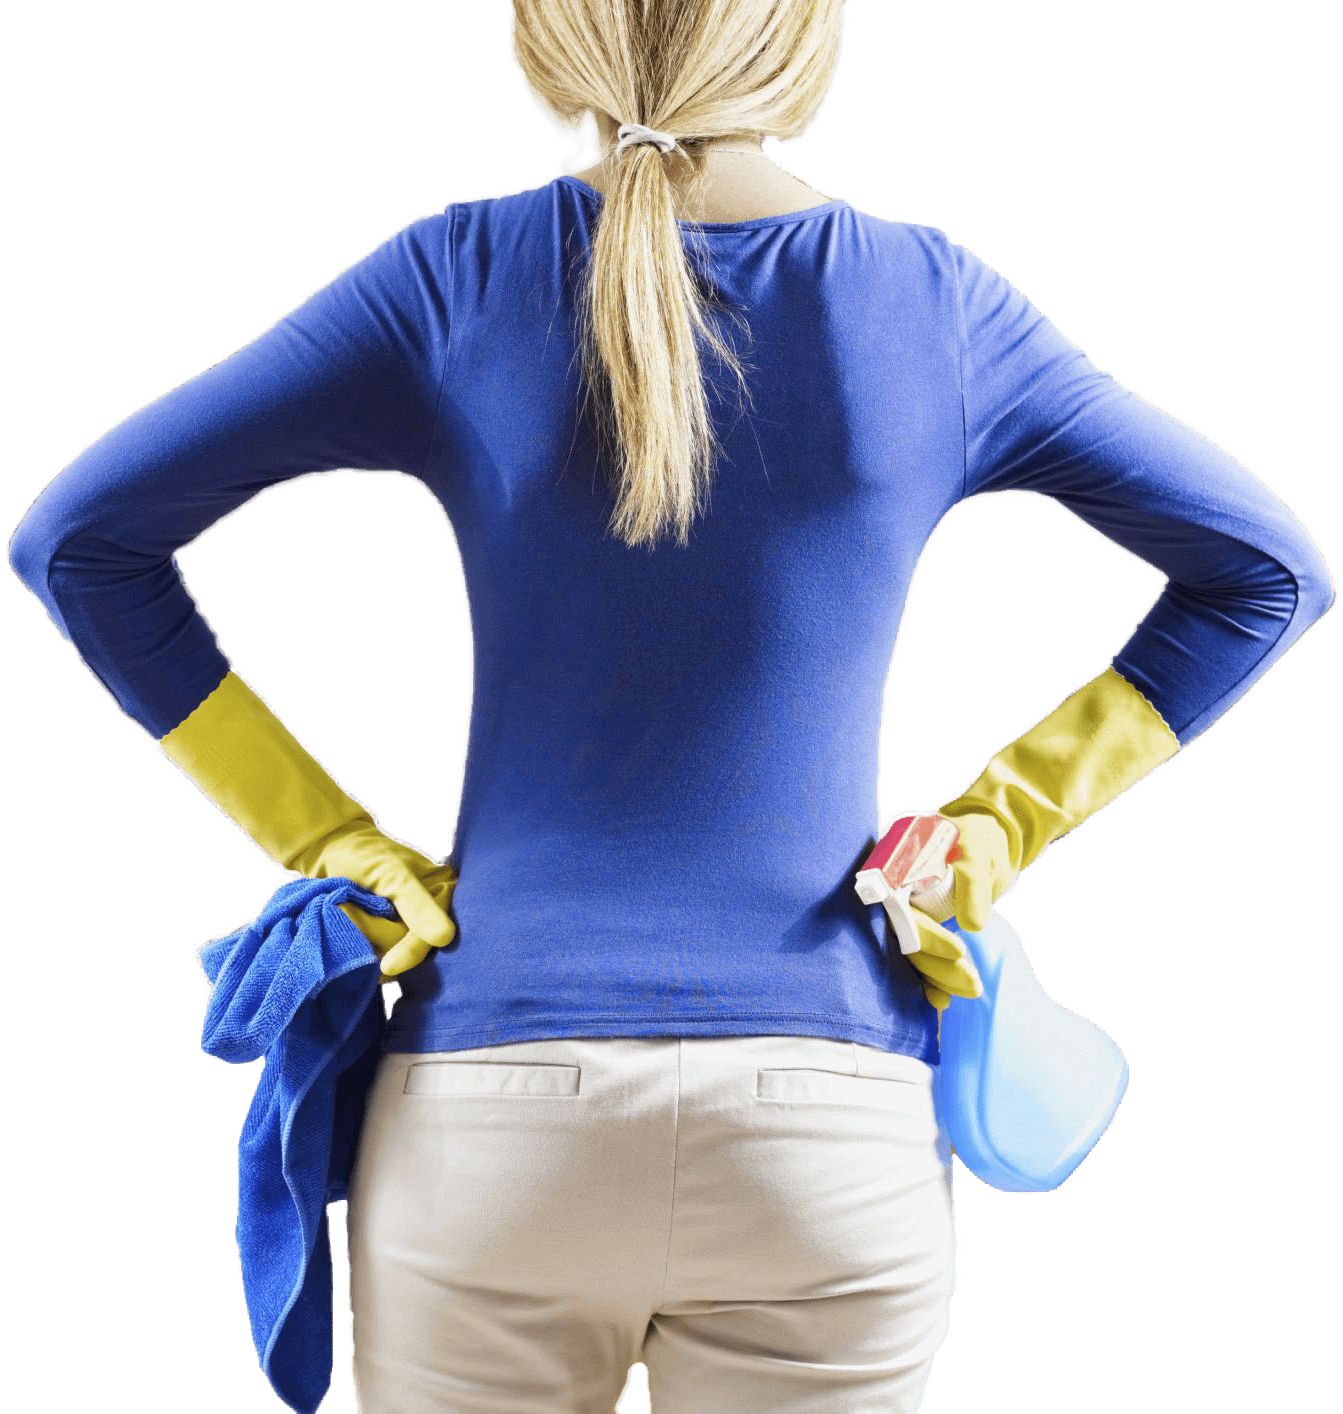 Rengøring Gv service